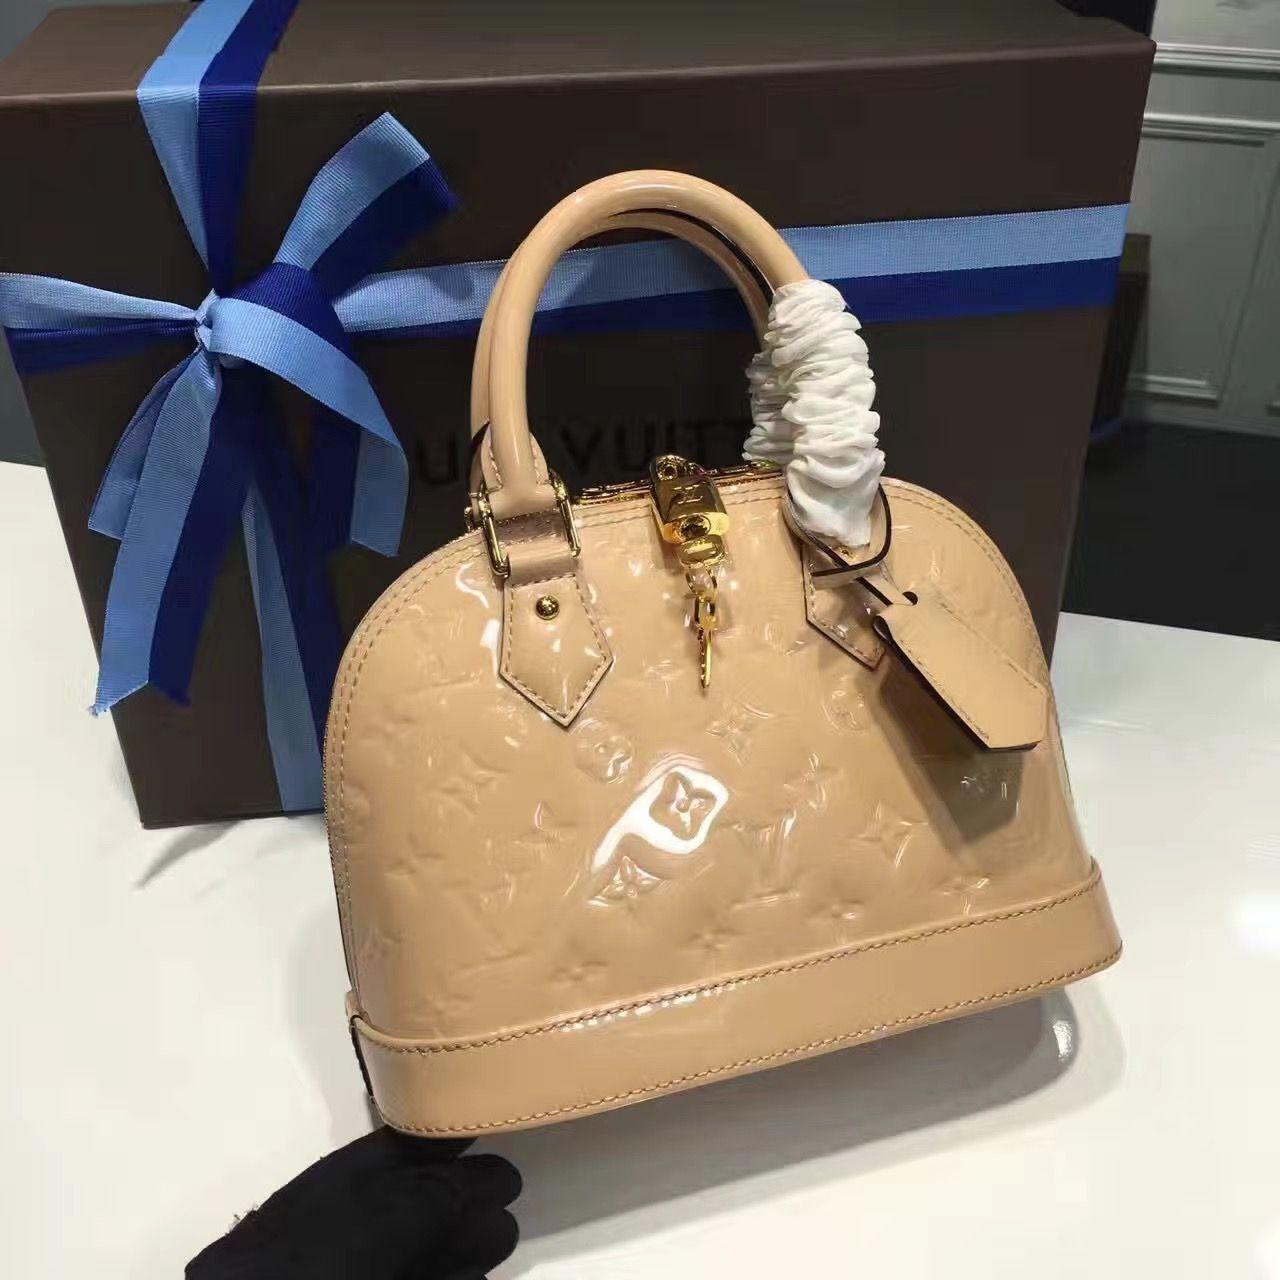 69081552ee8 Louis Vuitton Monogram Vernis Leather Alma BB Bag Dune M90175 ...